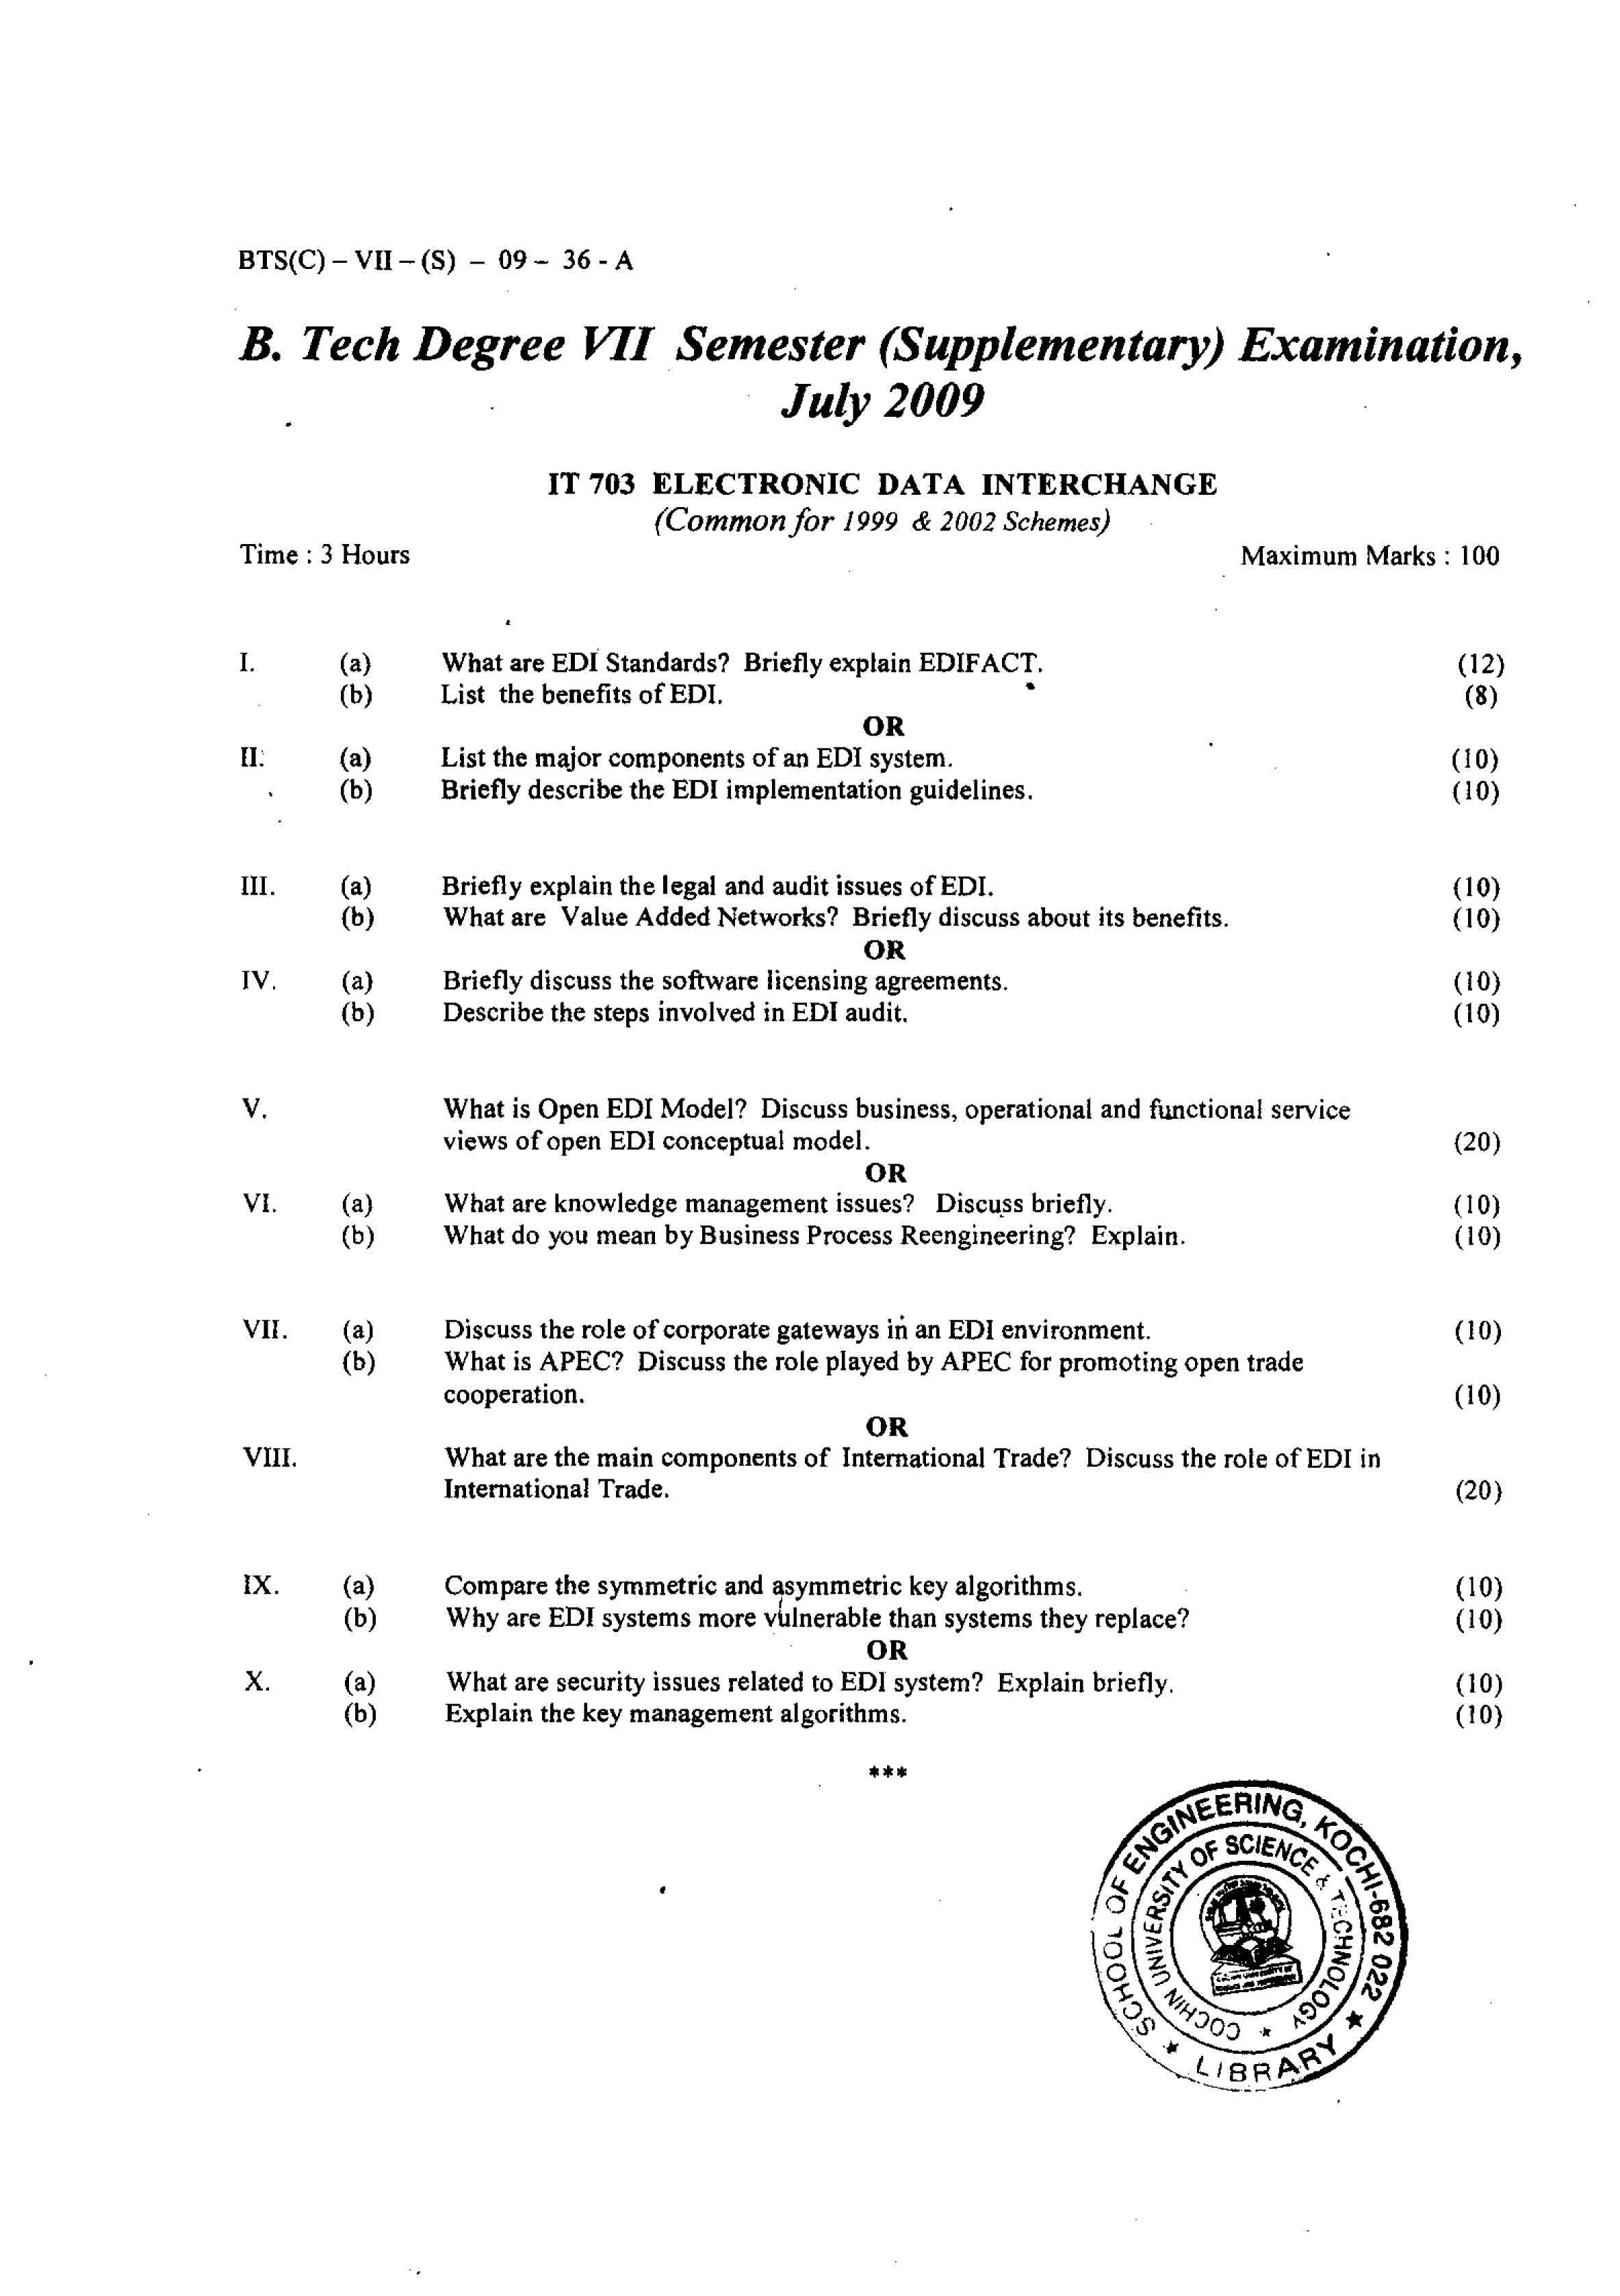 electronic data interchange information technology essay Business value of information technology: a study of electronic data  interchange mis quarterly vol19, iss 9: pg 137-156, , retrieved september 12,  2006.